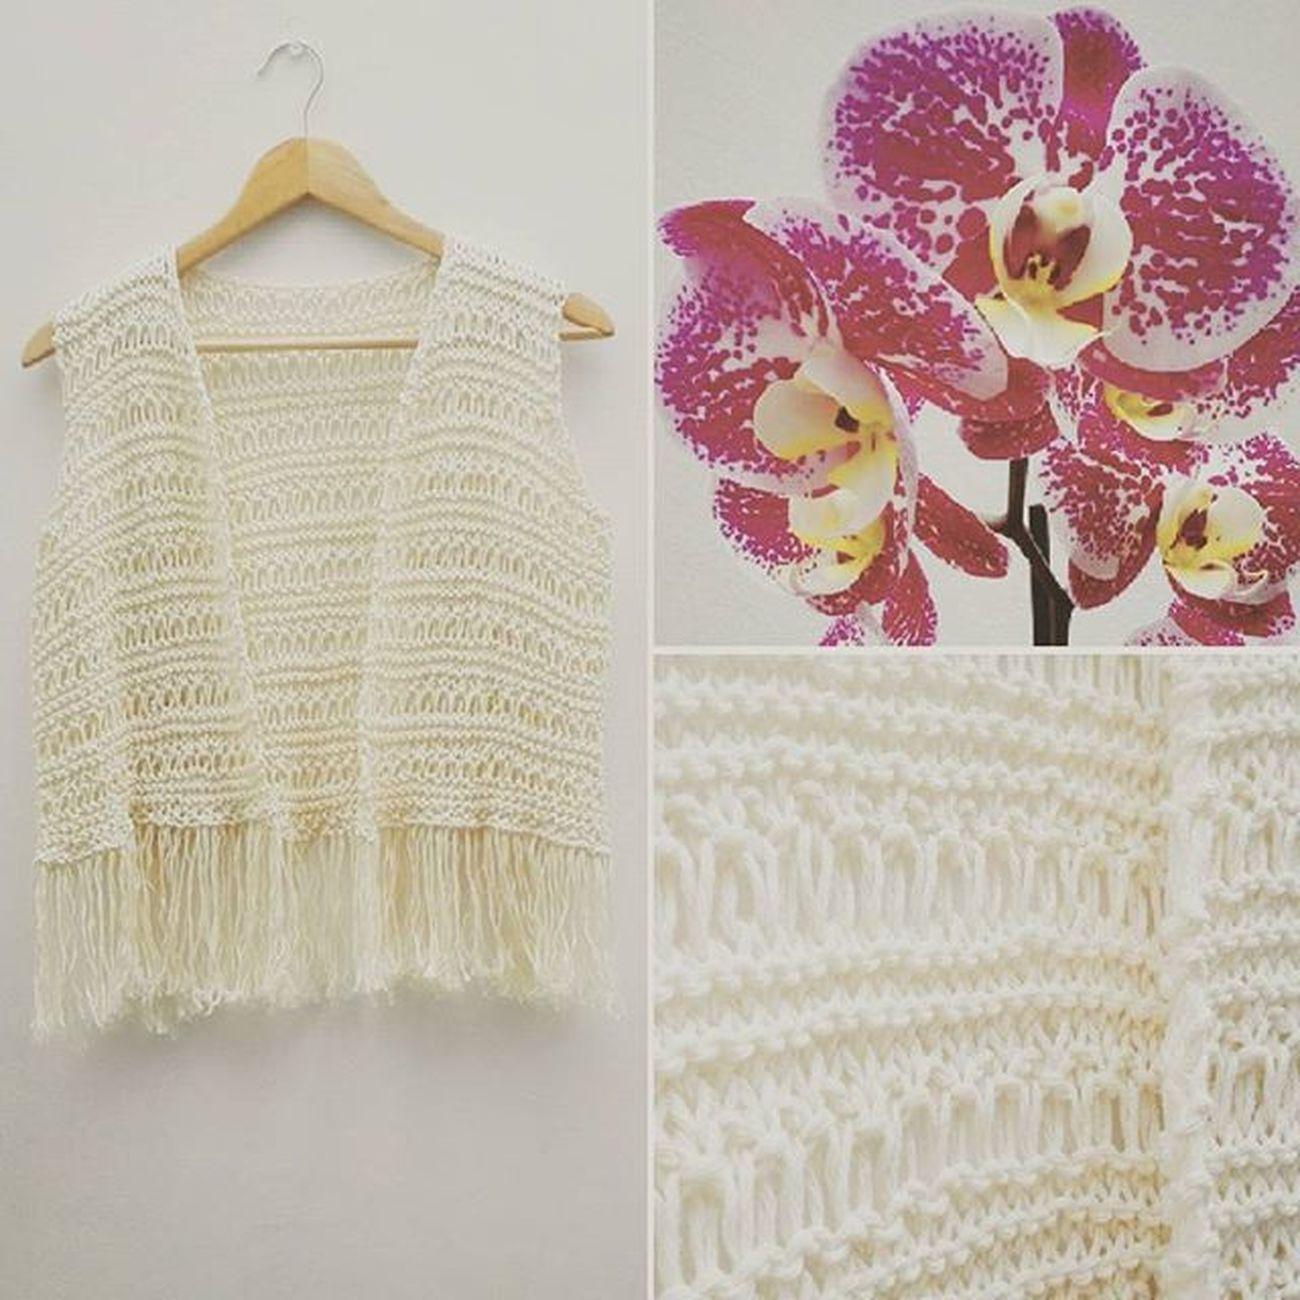 Boho Vest Chaleco Tatapatata Handmade Handmadewithlove Knitwear Knit Cotton Summer Flecos Orchid Orquídea Natura Love Romantic